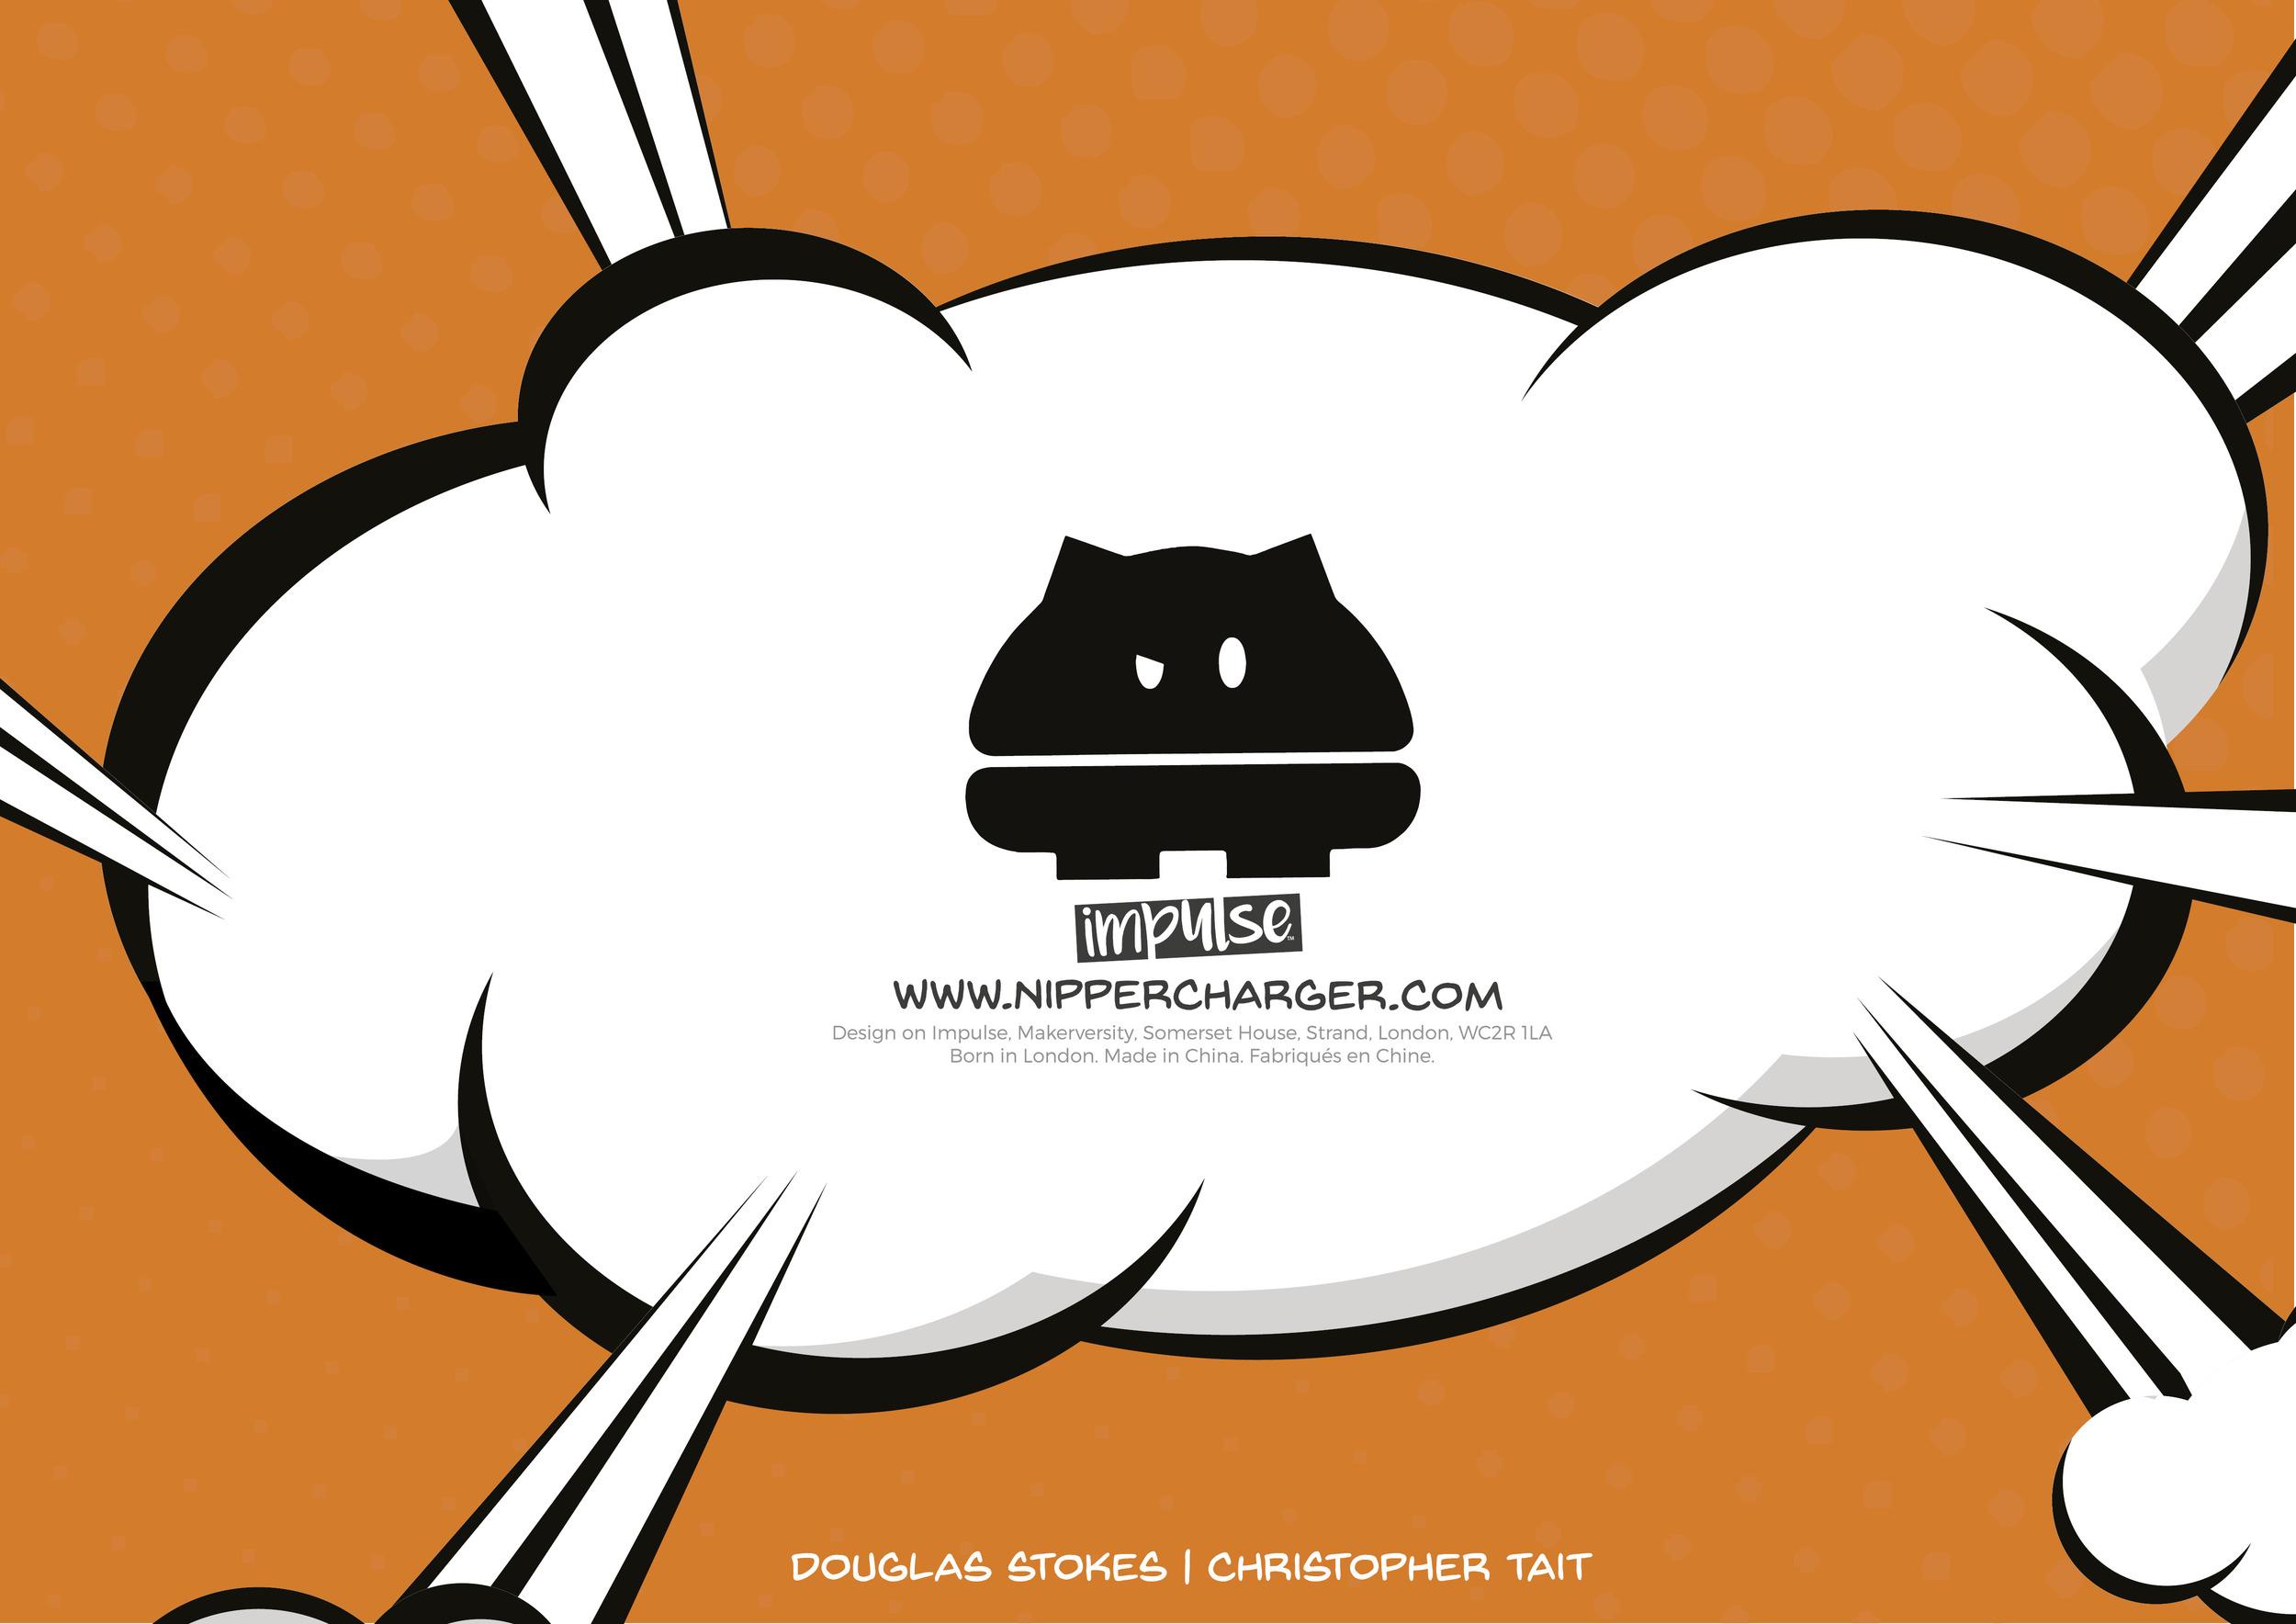 Nipper Pitch Deck DL images13.jpg